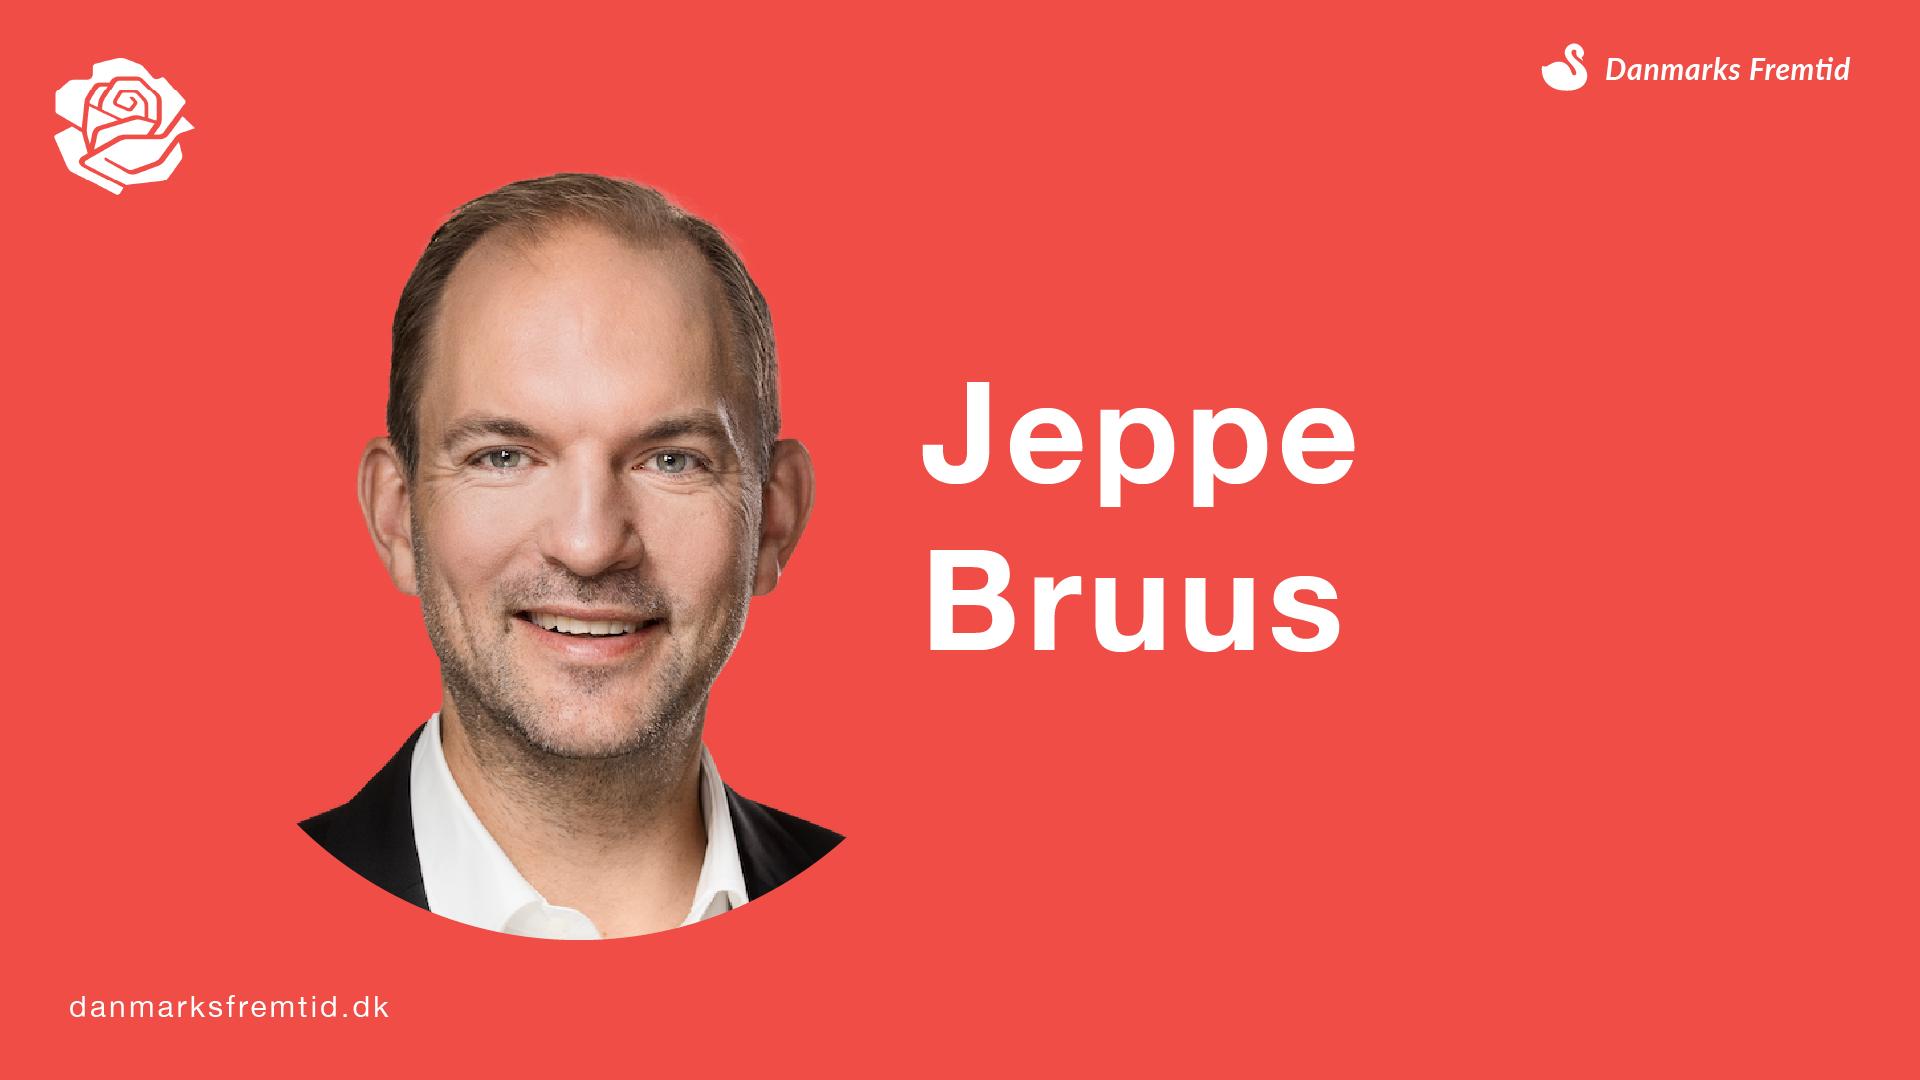 Jeppe Bruus - Socialdemokratiet